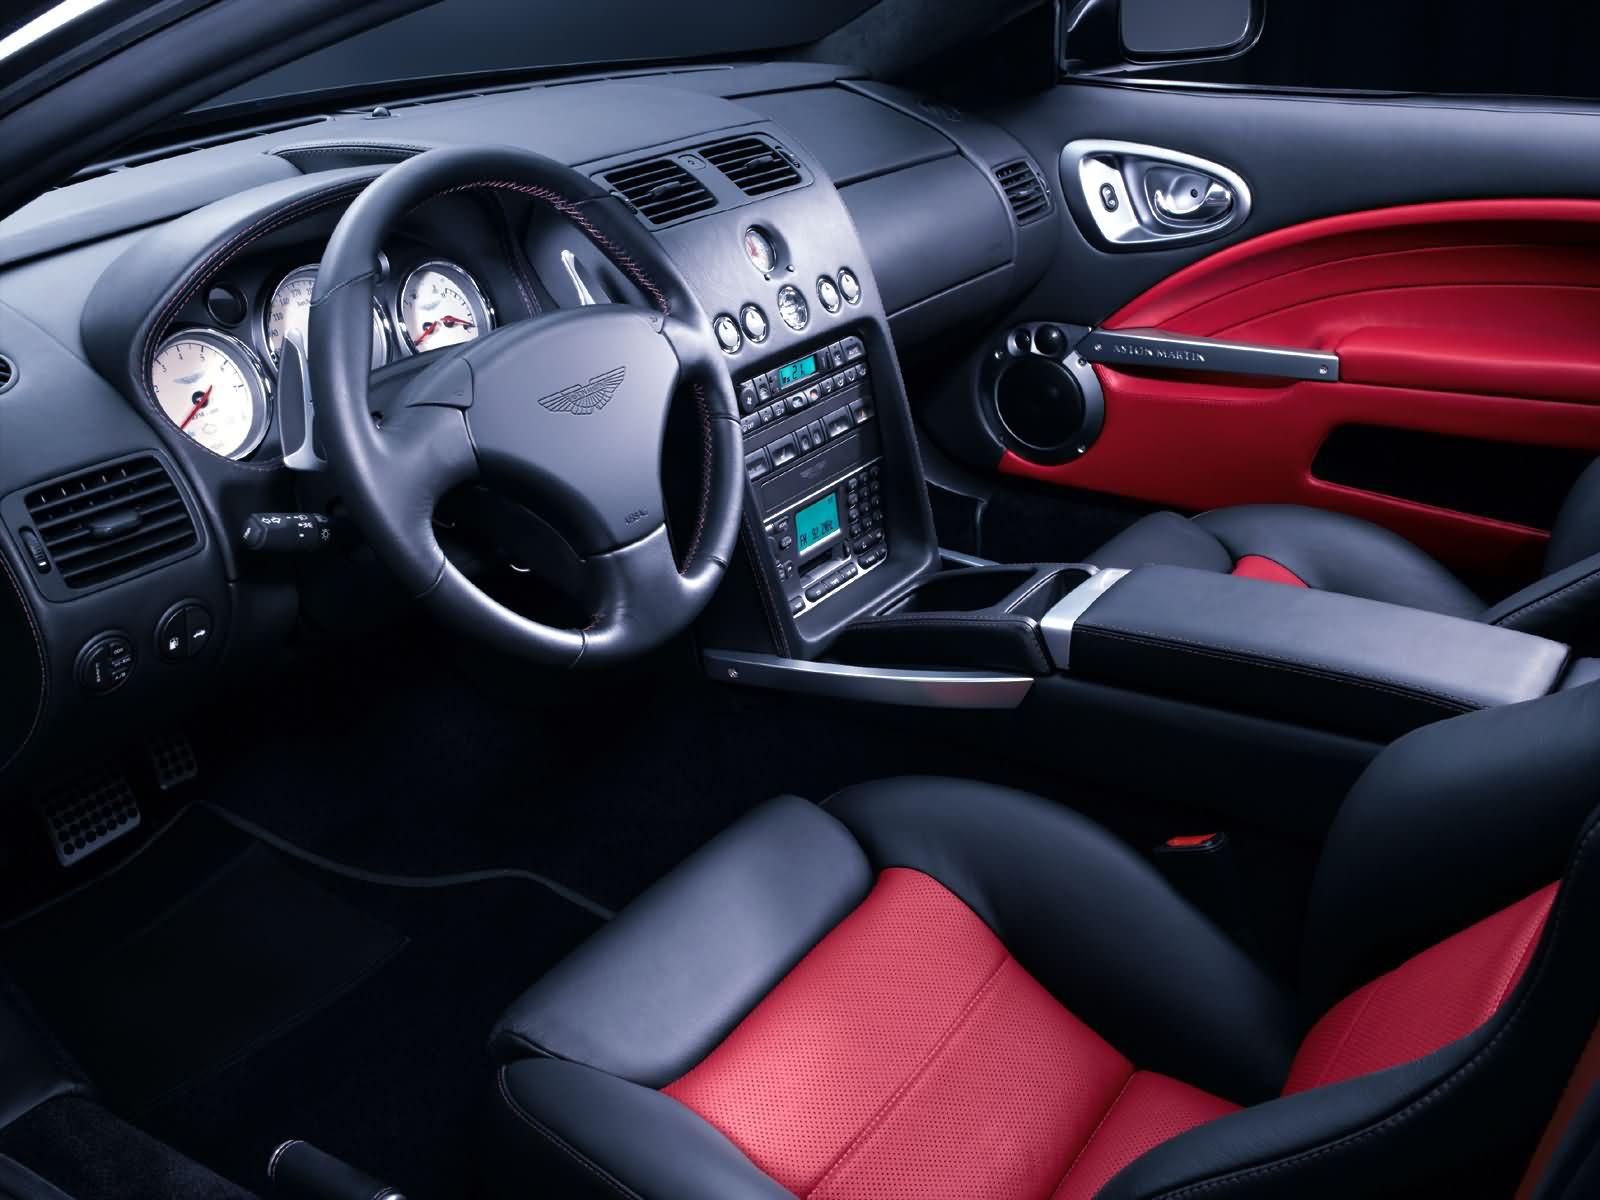 картинки из нутри авто технологии